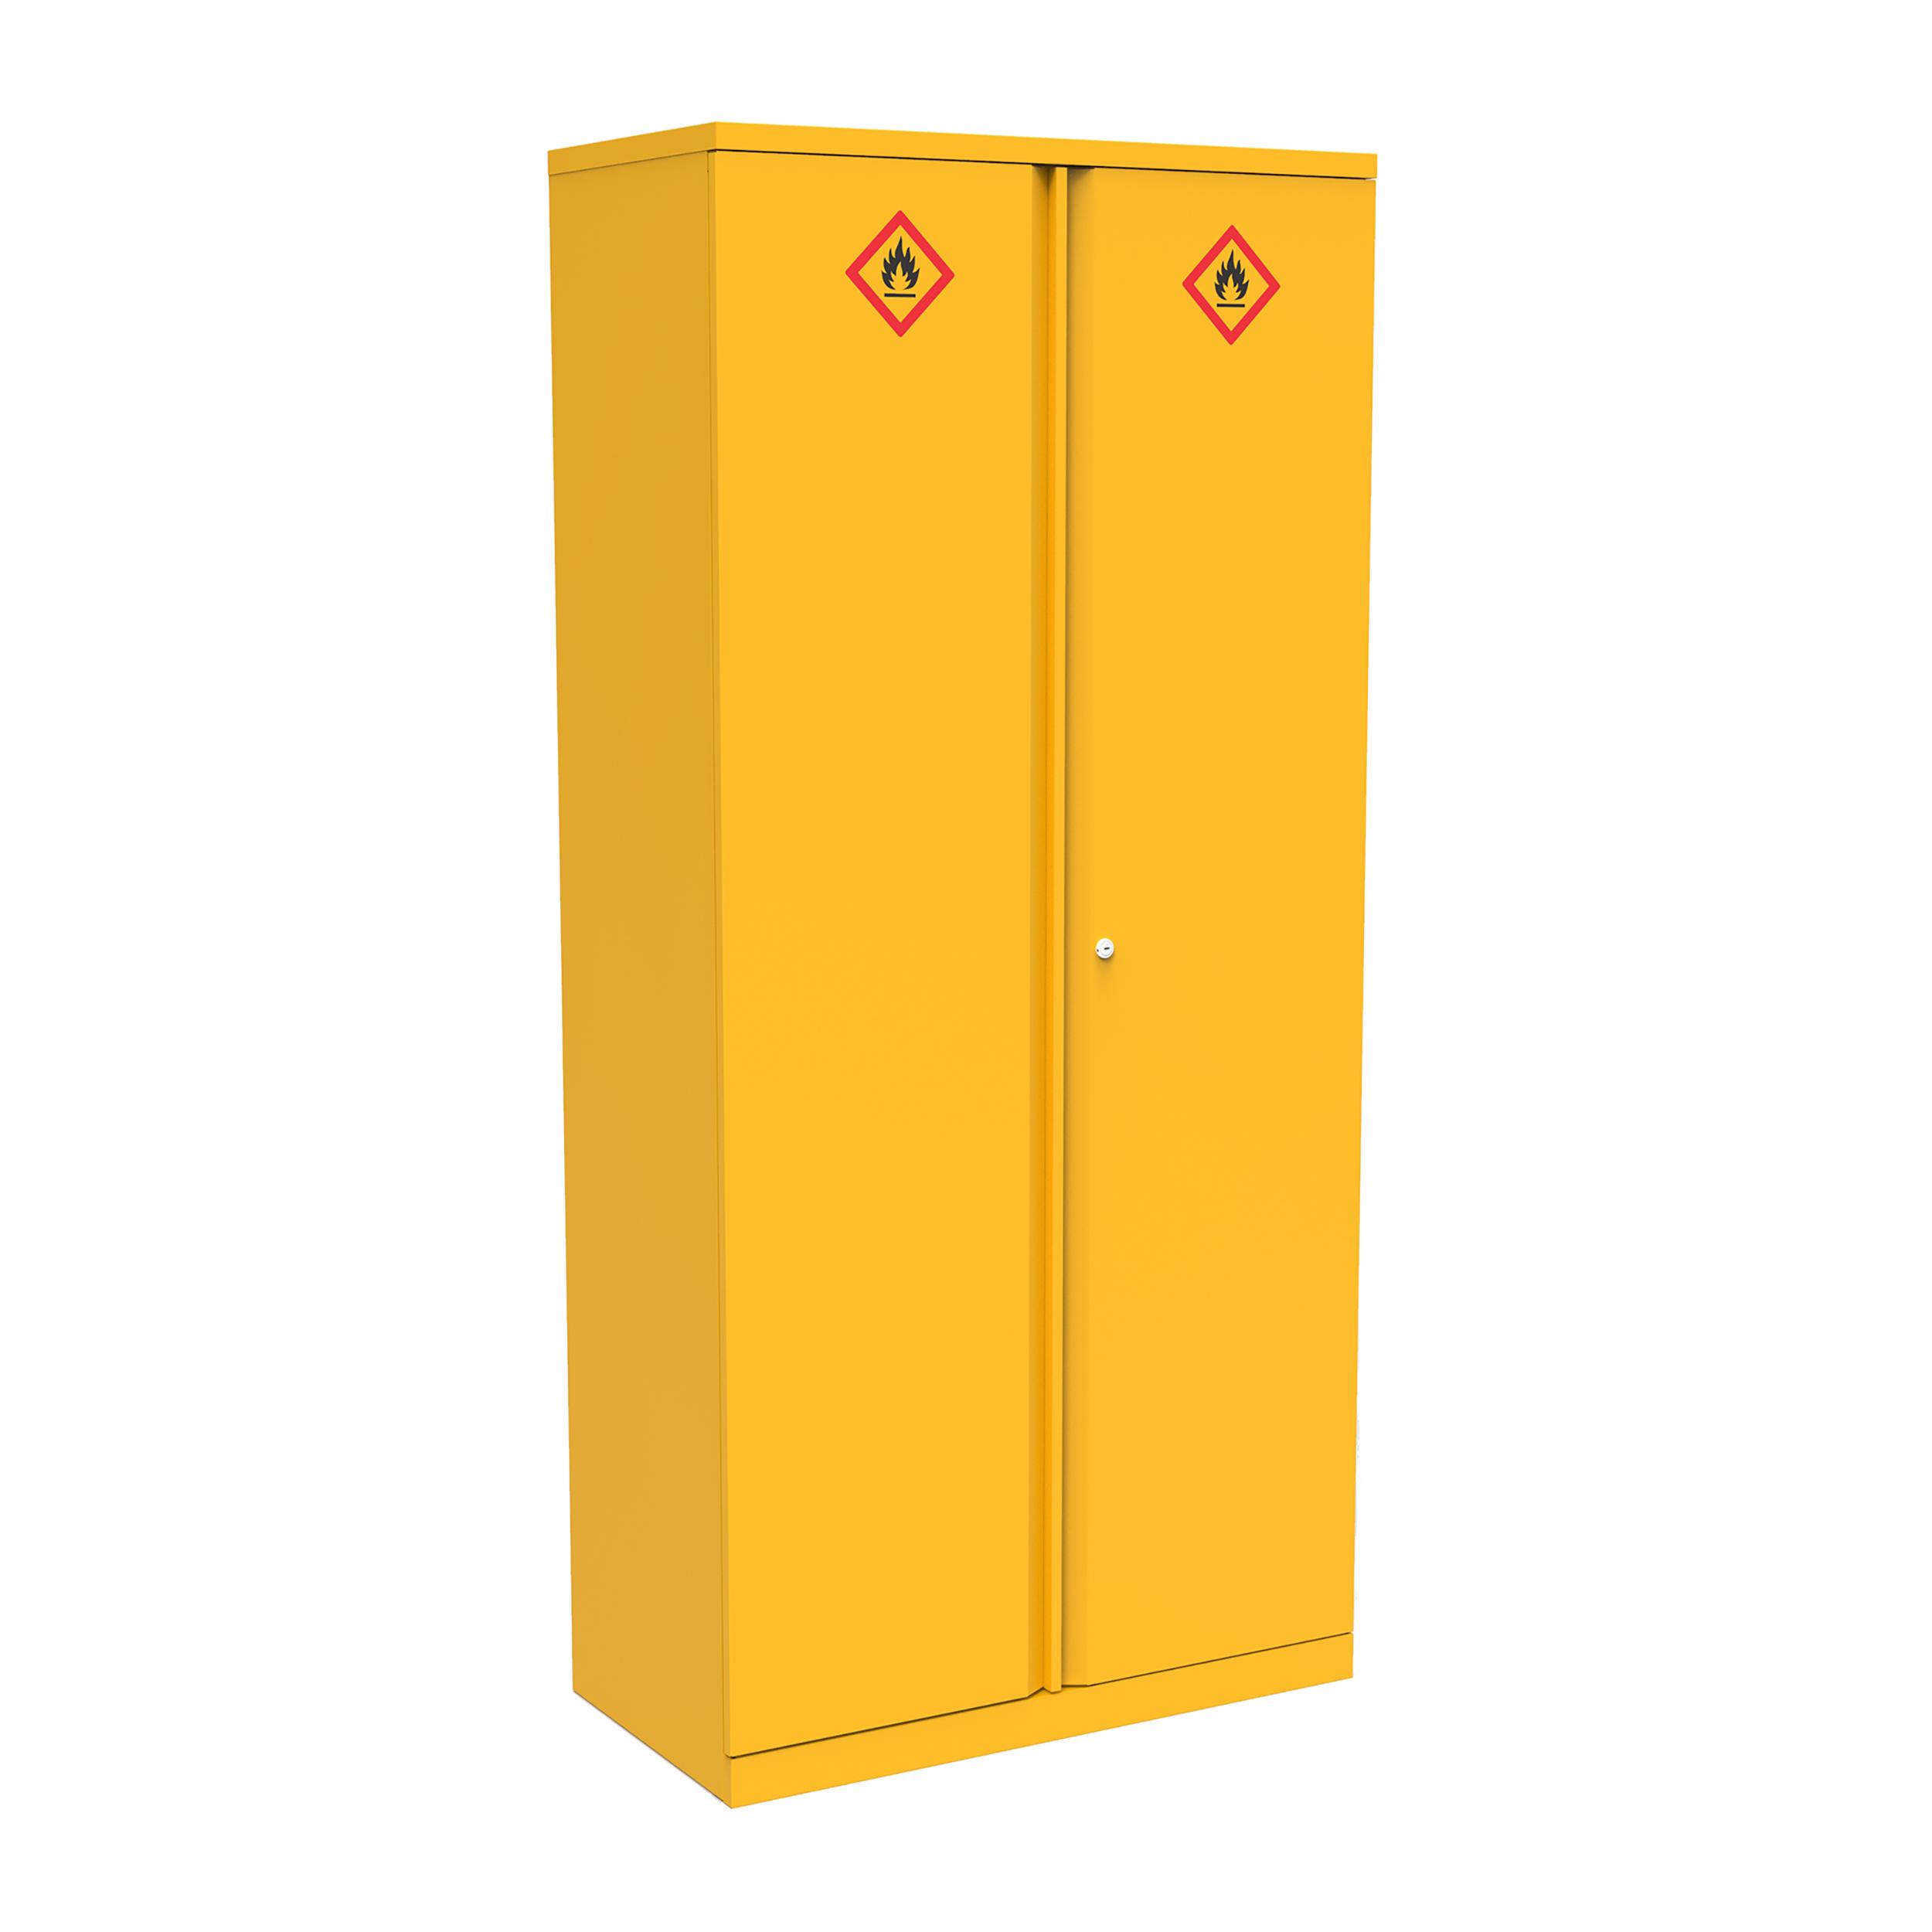 Domestic cupboard Bisley Hazardous Substances Cabinet 3 Shelves 914x470x1806 Ref HCB0918